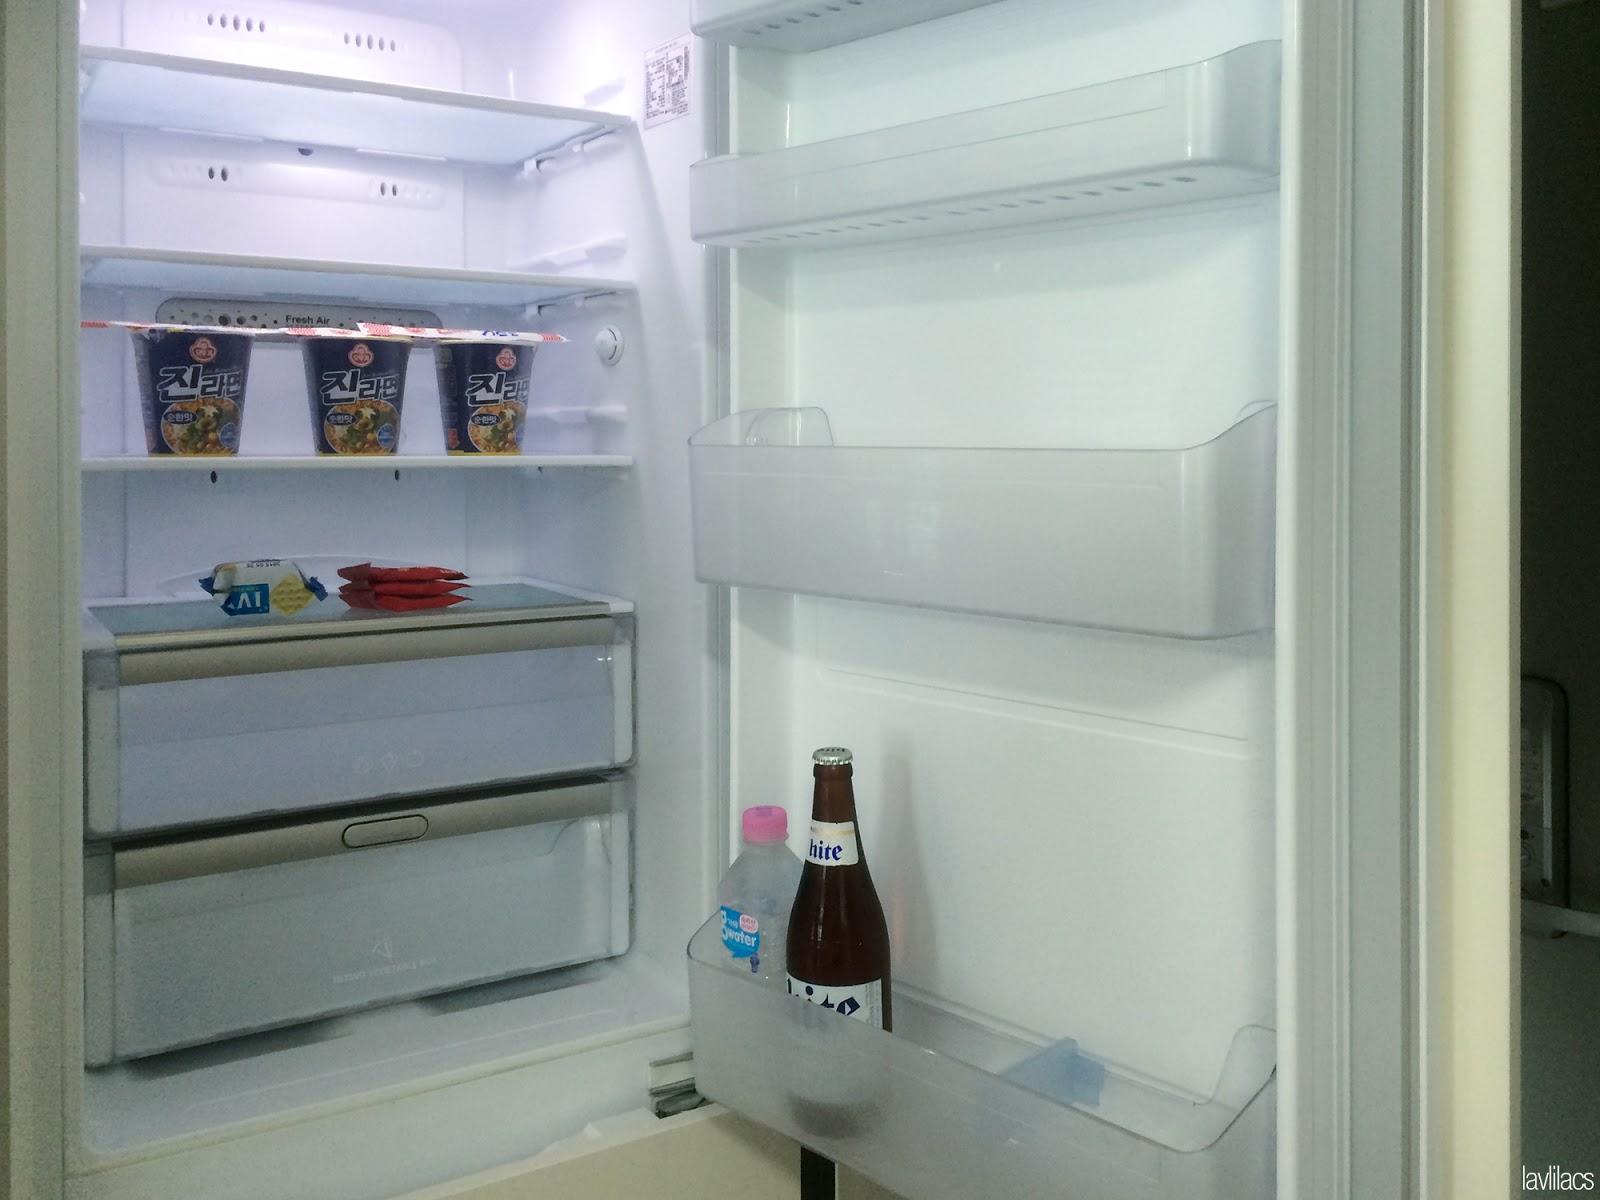 Seoul, Korea - Summer Study Abroad 2014 - Busan studio refrigerator via AirBnB